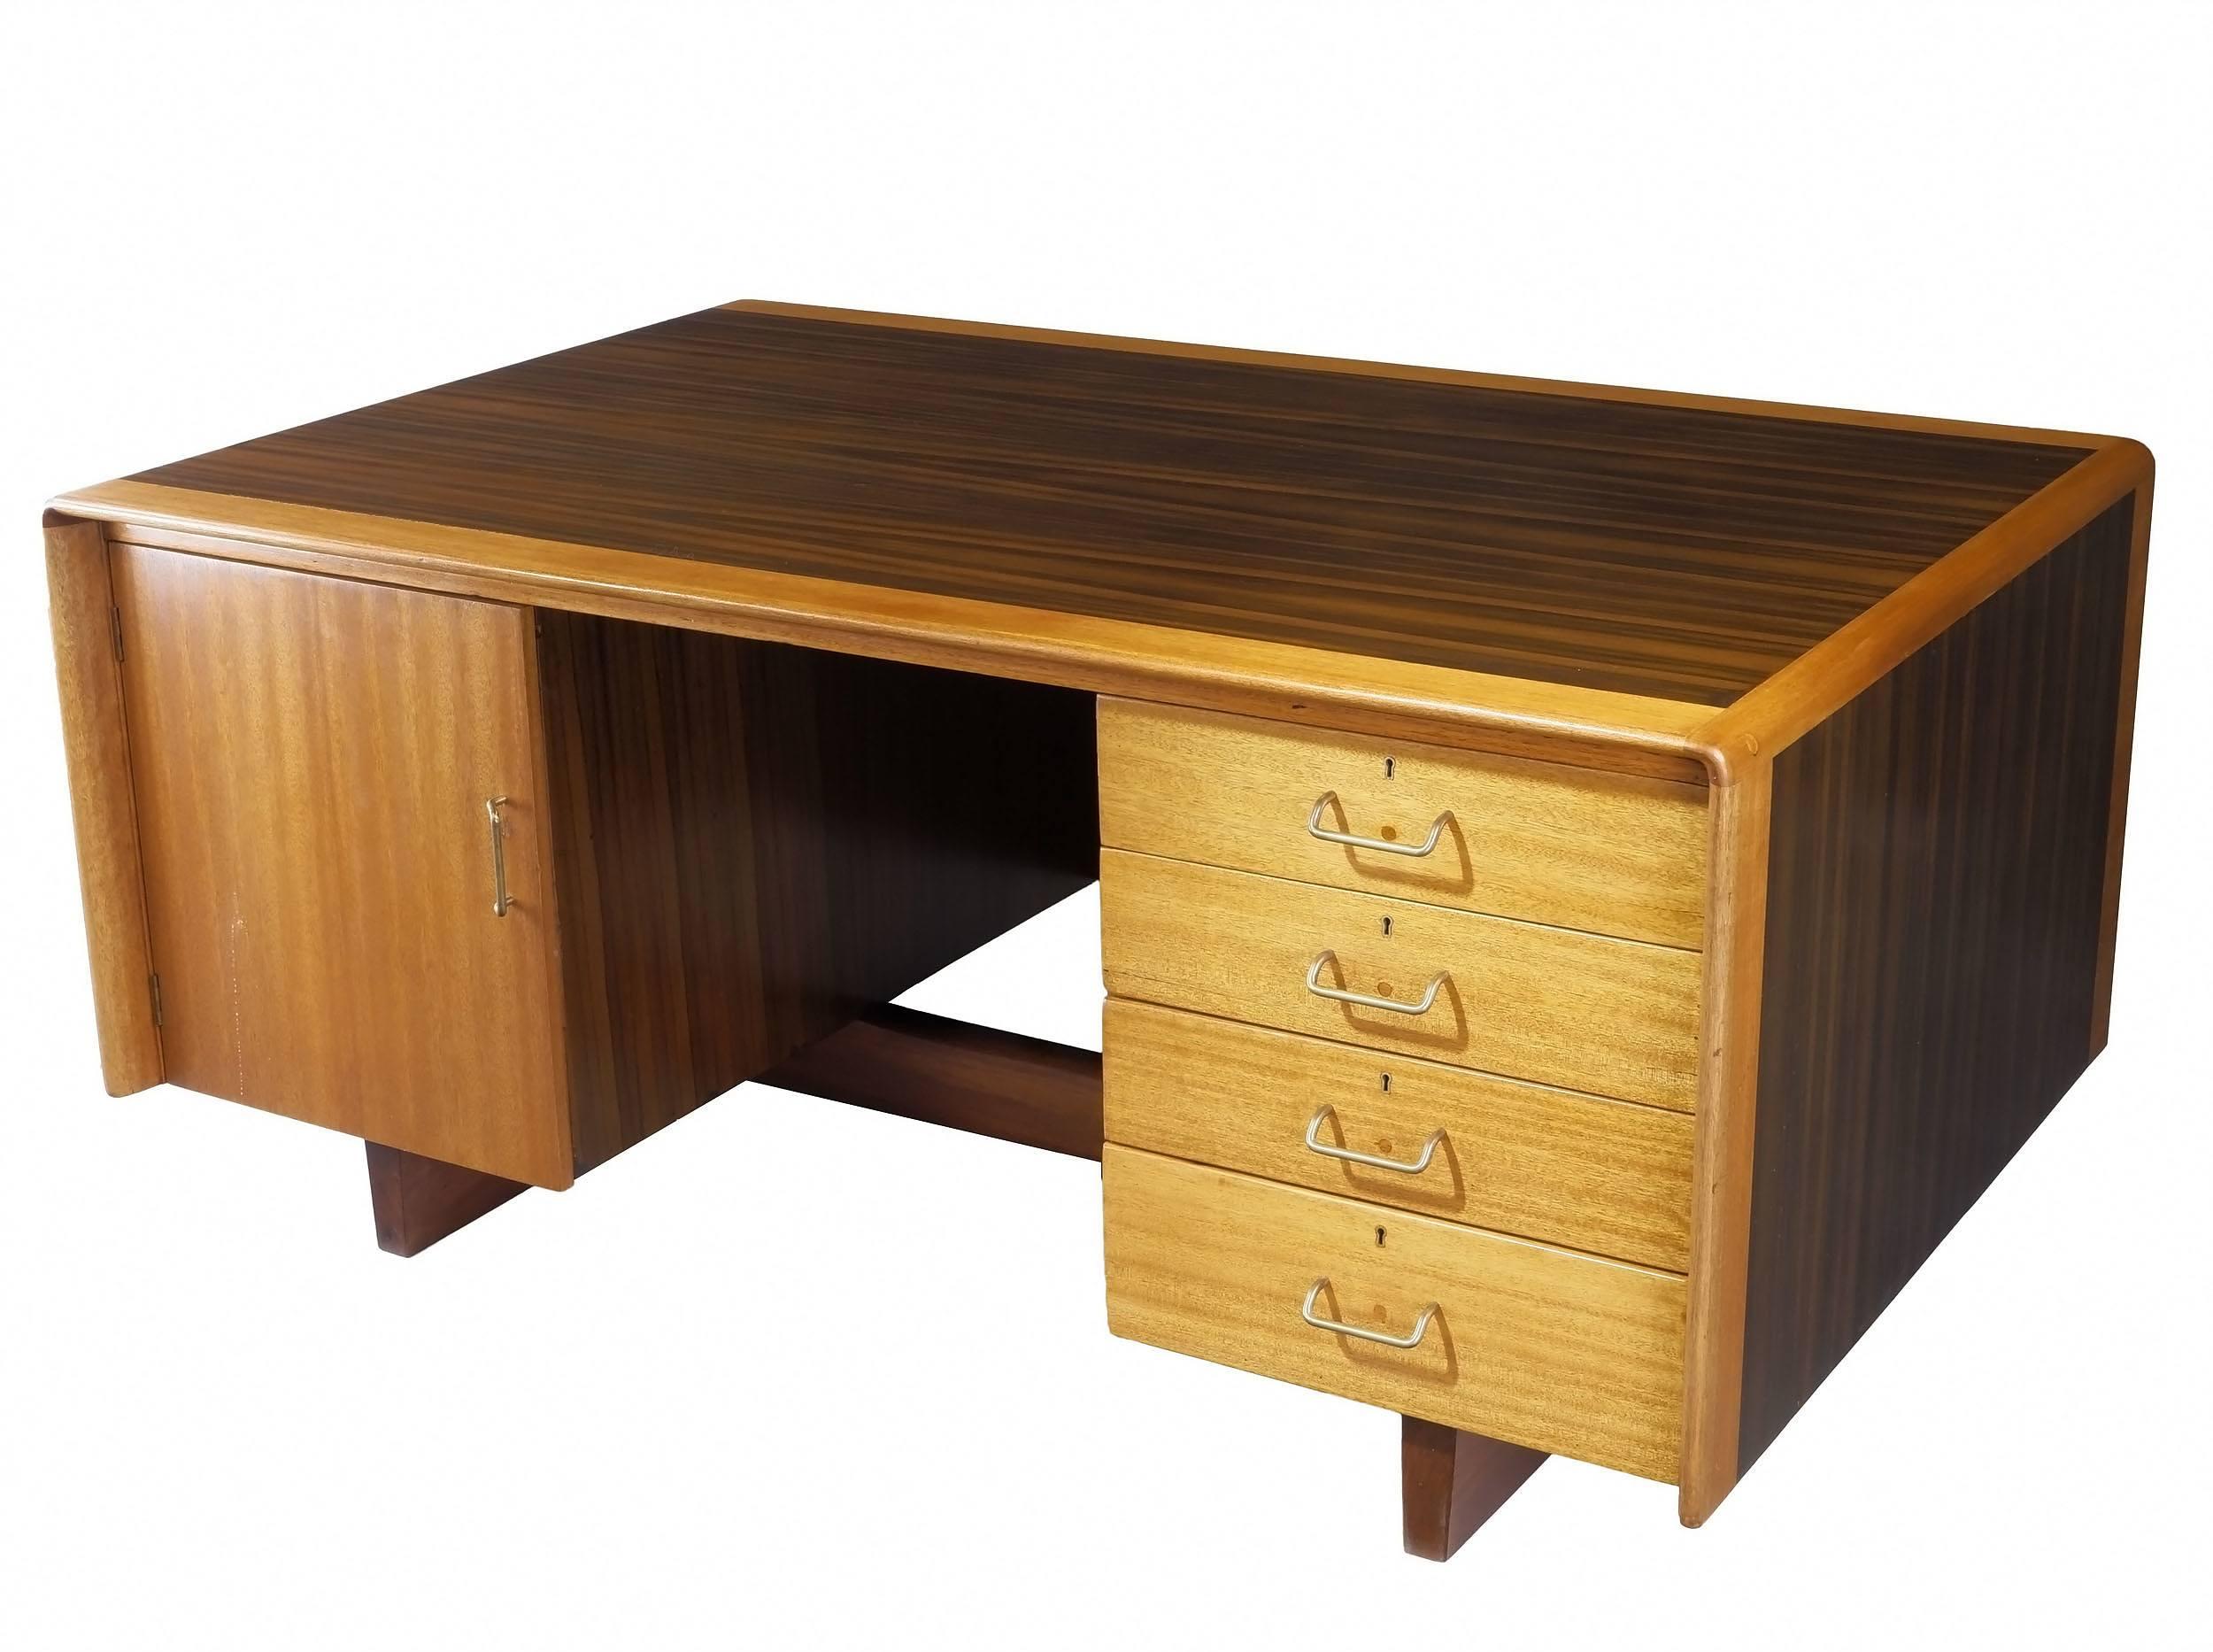 'Vintage Queensland Black Walnut and Maple Executive Desk Circa 1960s'